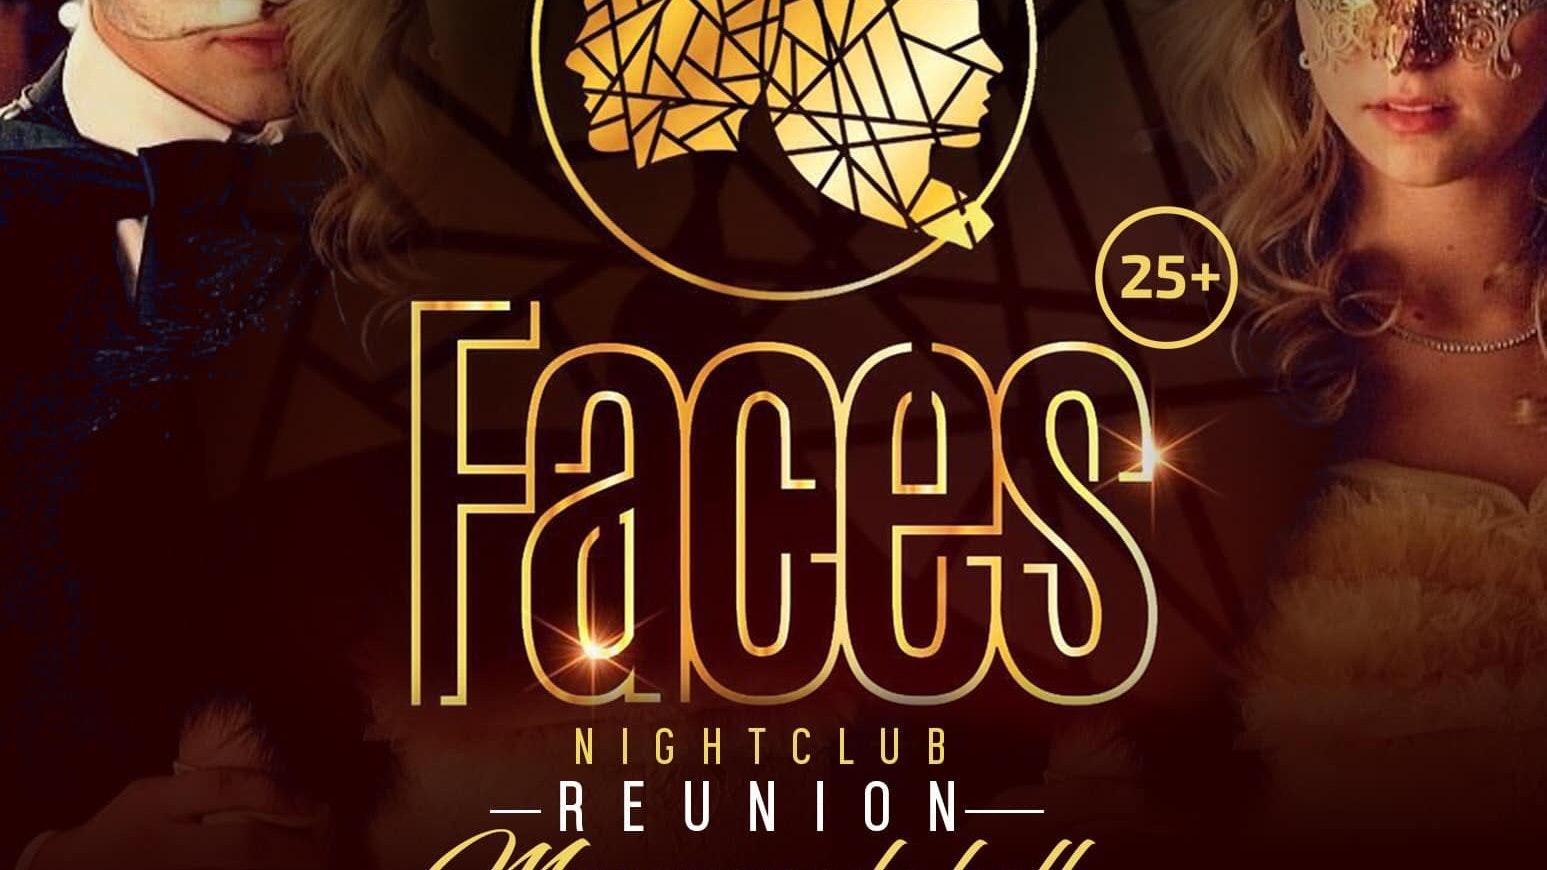 Faces Night Club Reunion